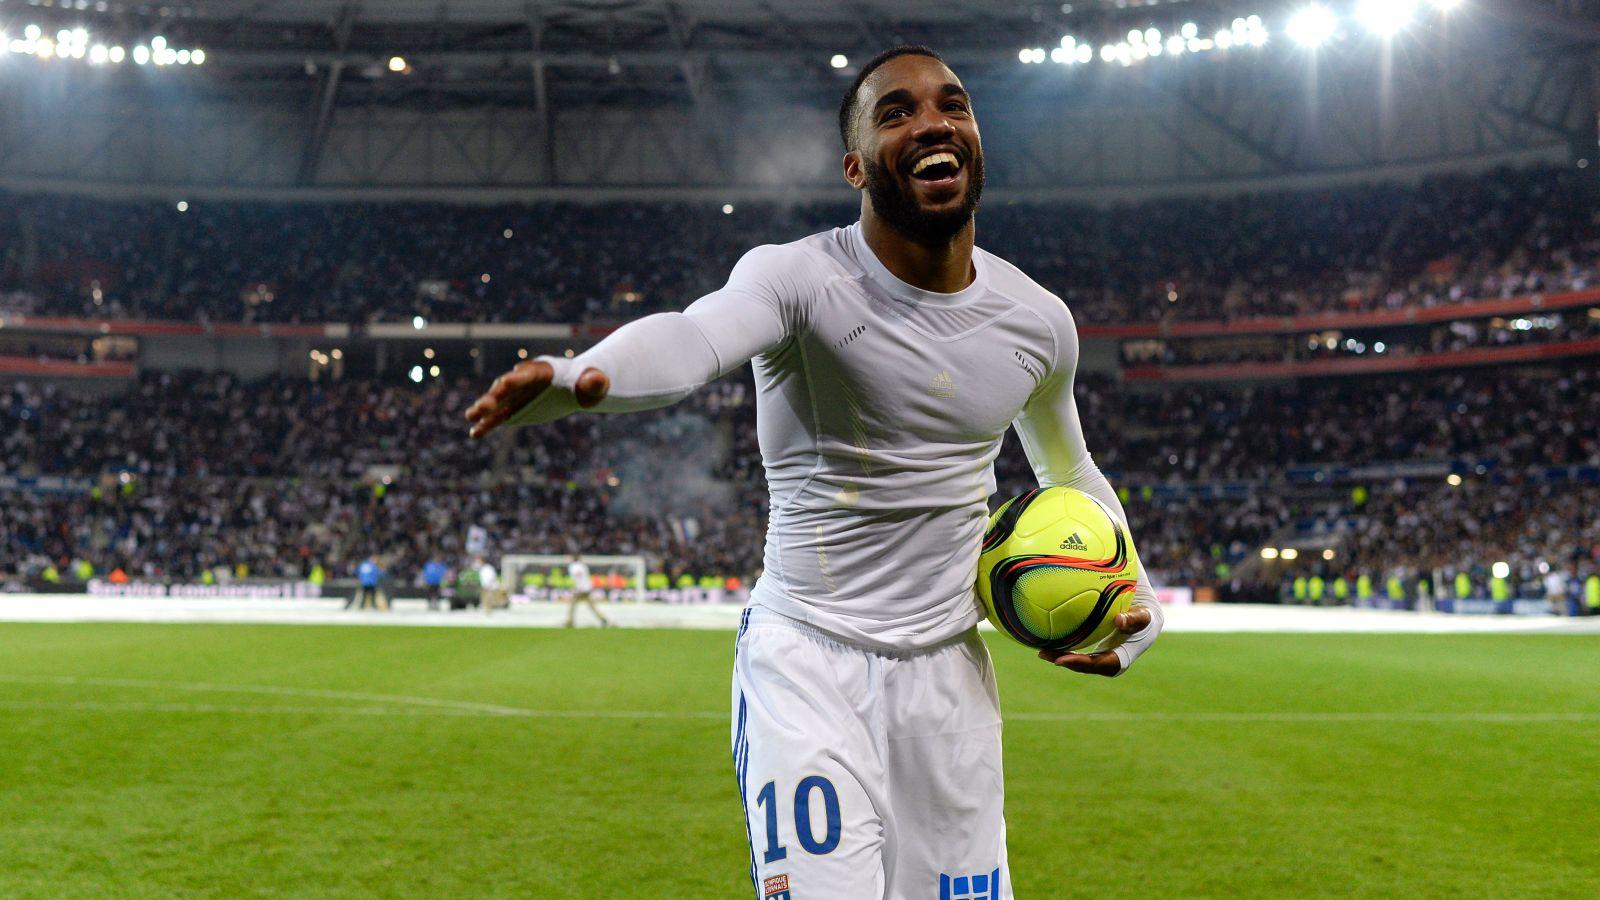 Arsenal ready to join race for Lyon striker Lacazette